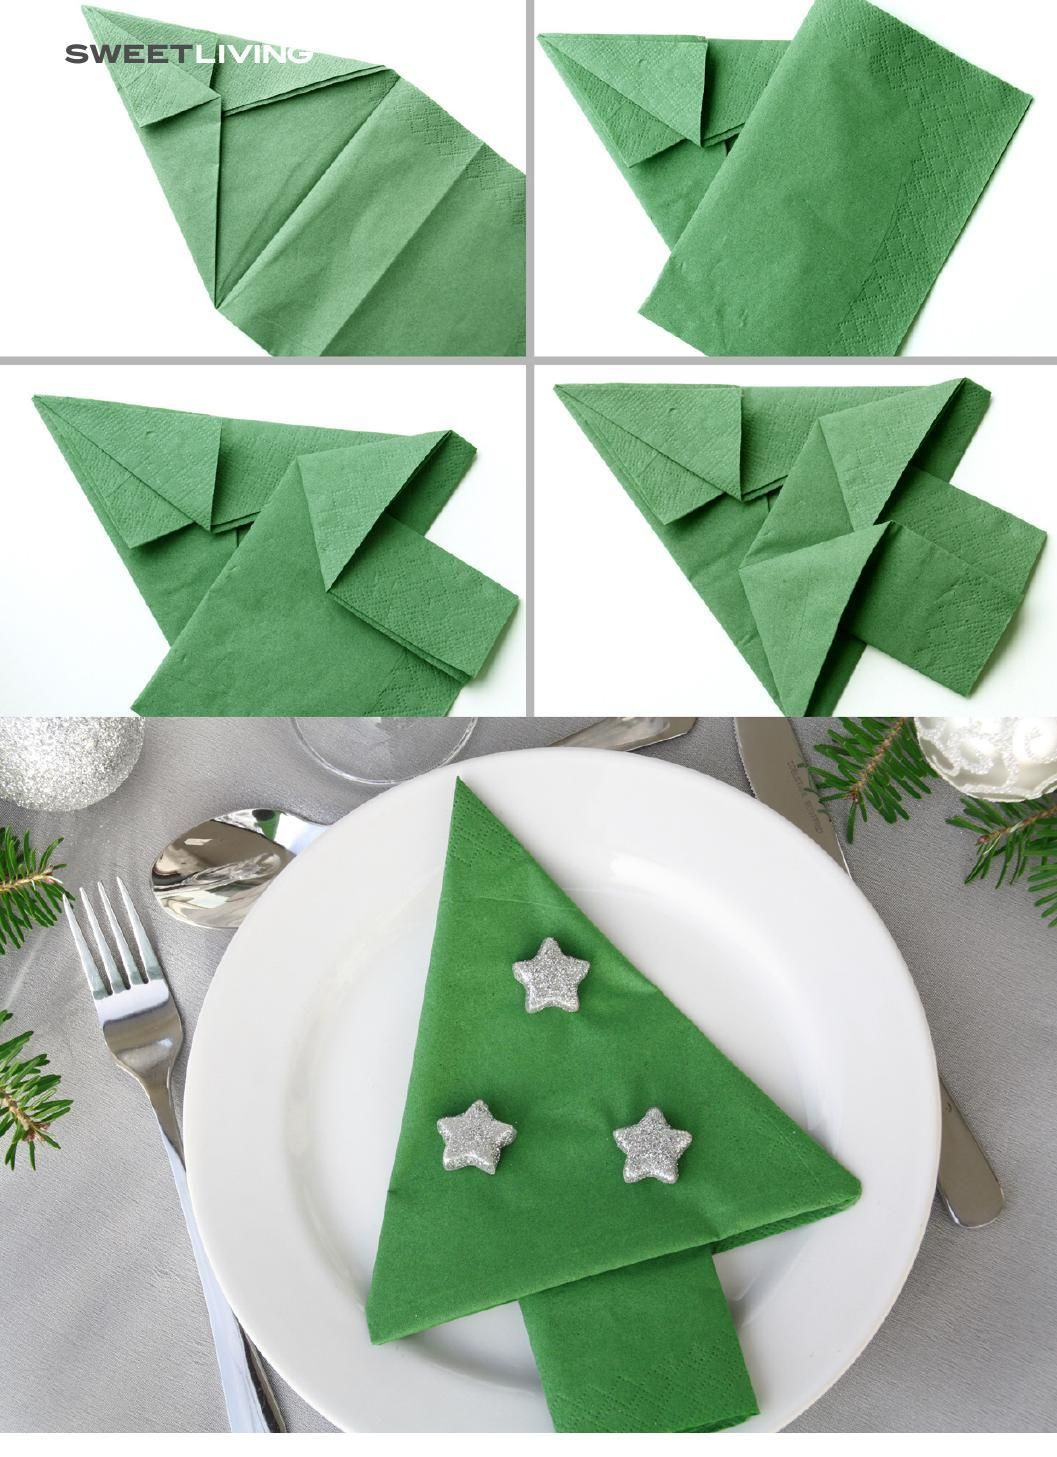 Sweet Living Magazine 7 Christmas Tree Napkin Fold Christmas Tree Napkins Christmas Napkin Folding